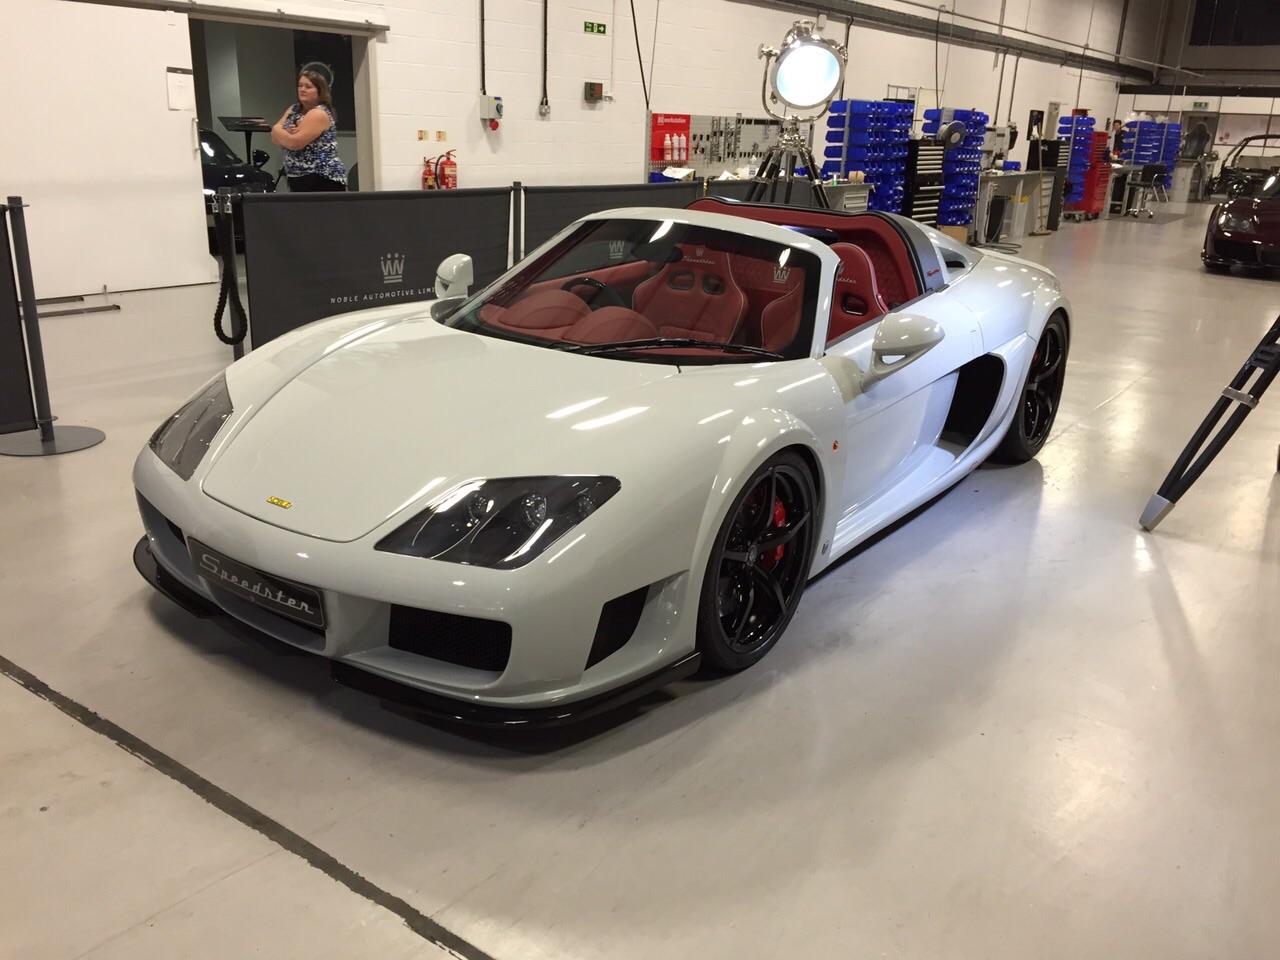 Super Cars, part 21